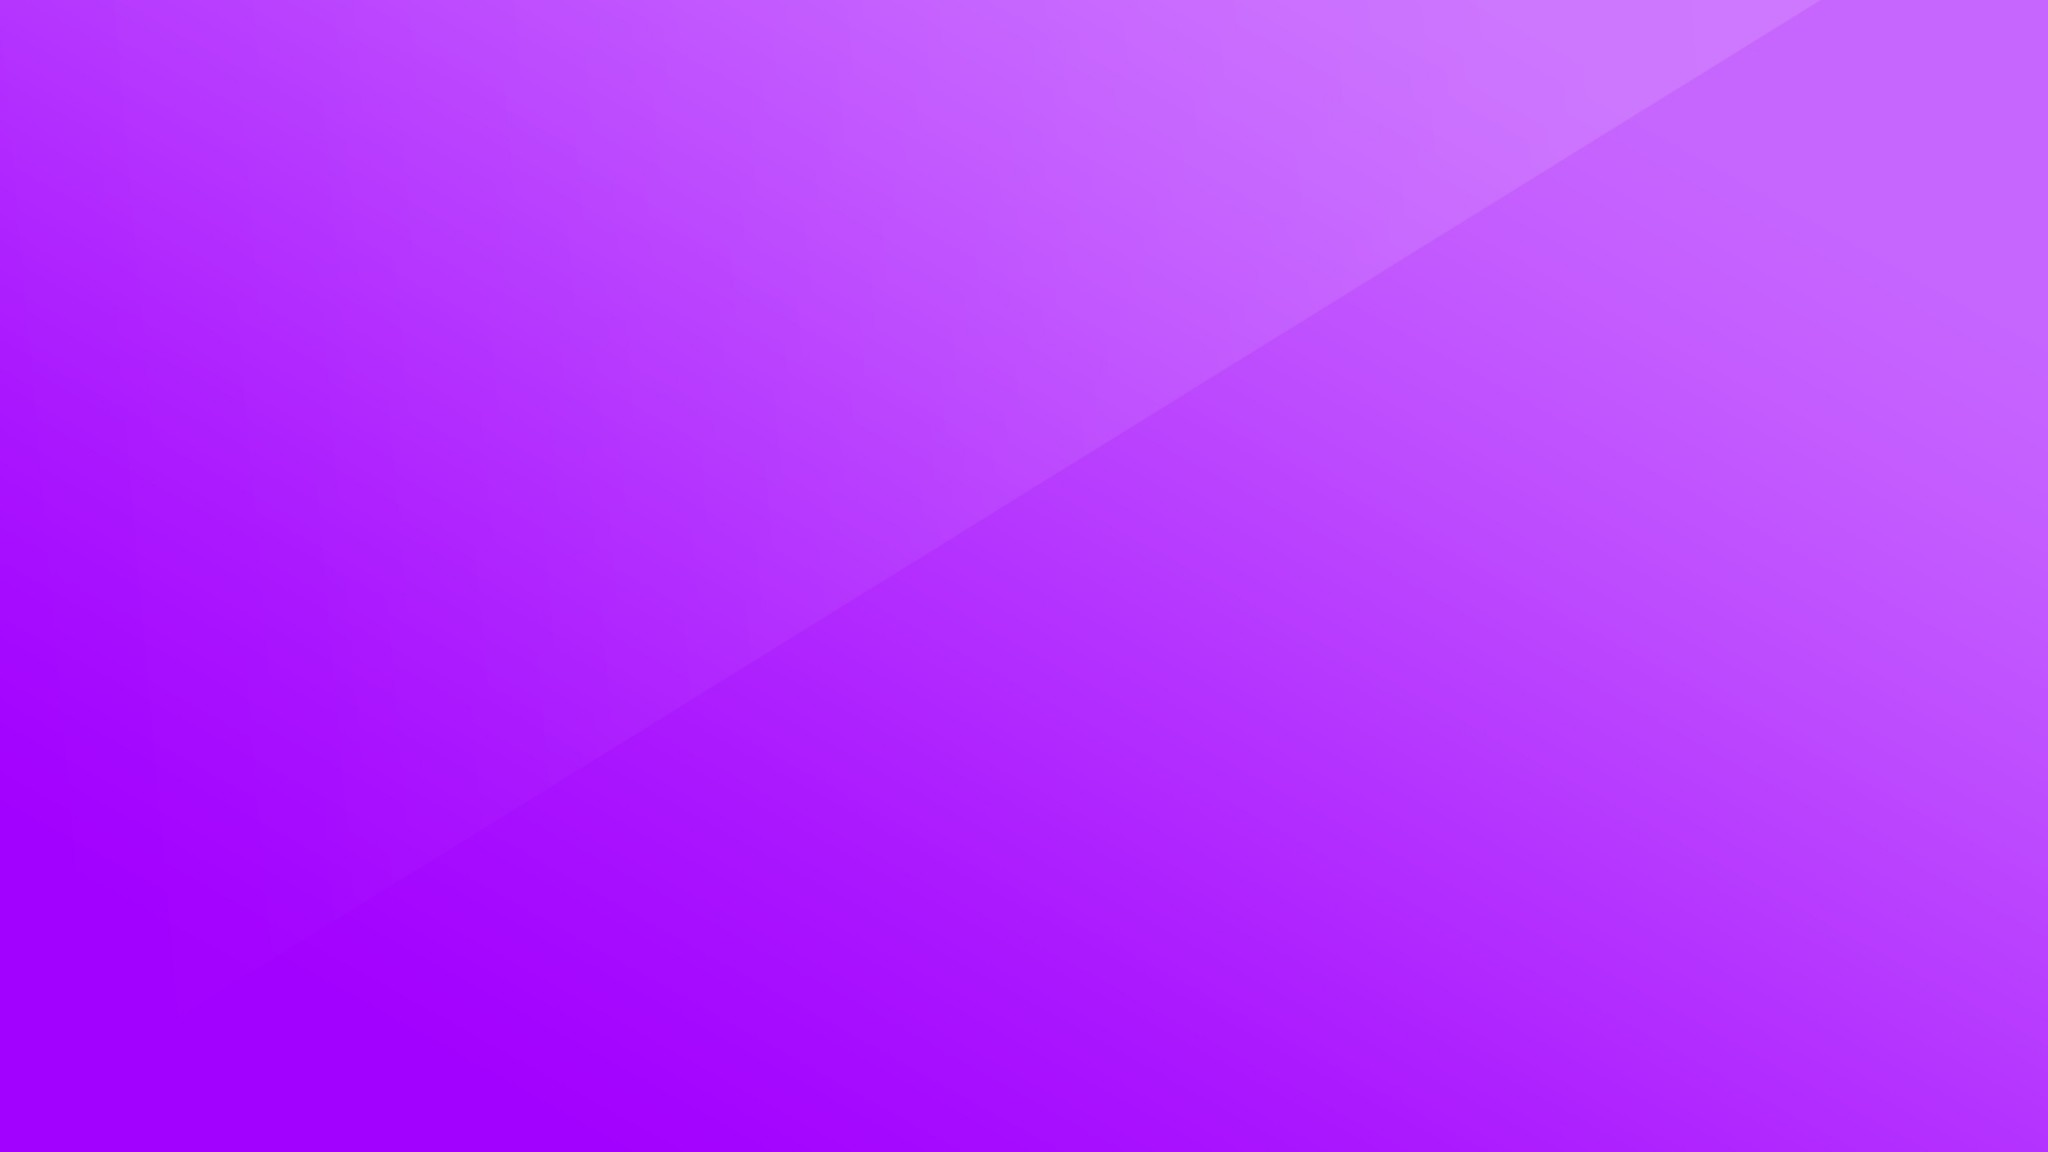 Purple Wallpaper For Phones: Light Purple Backgrounds ·① WallpaperTag